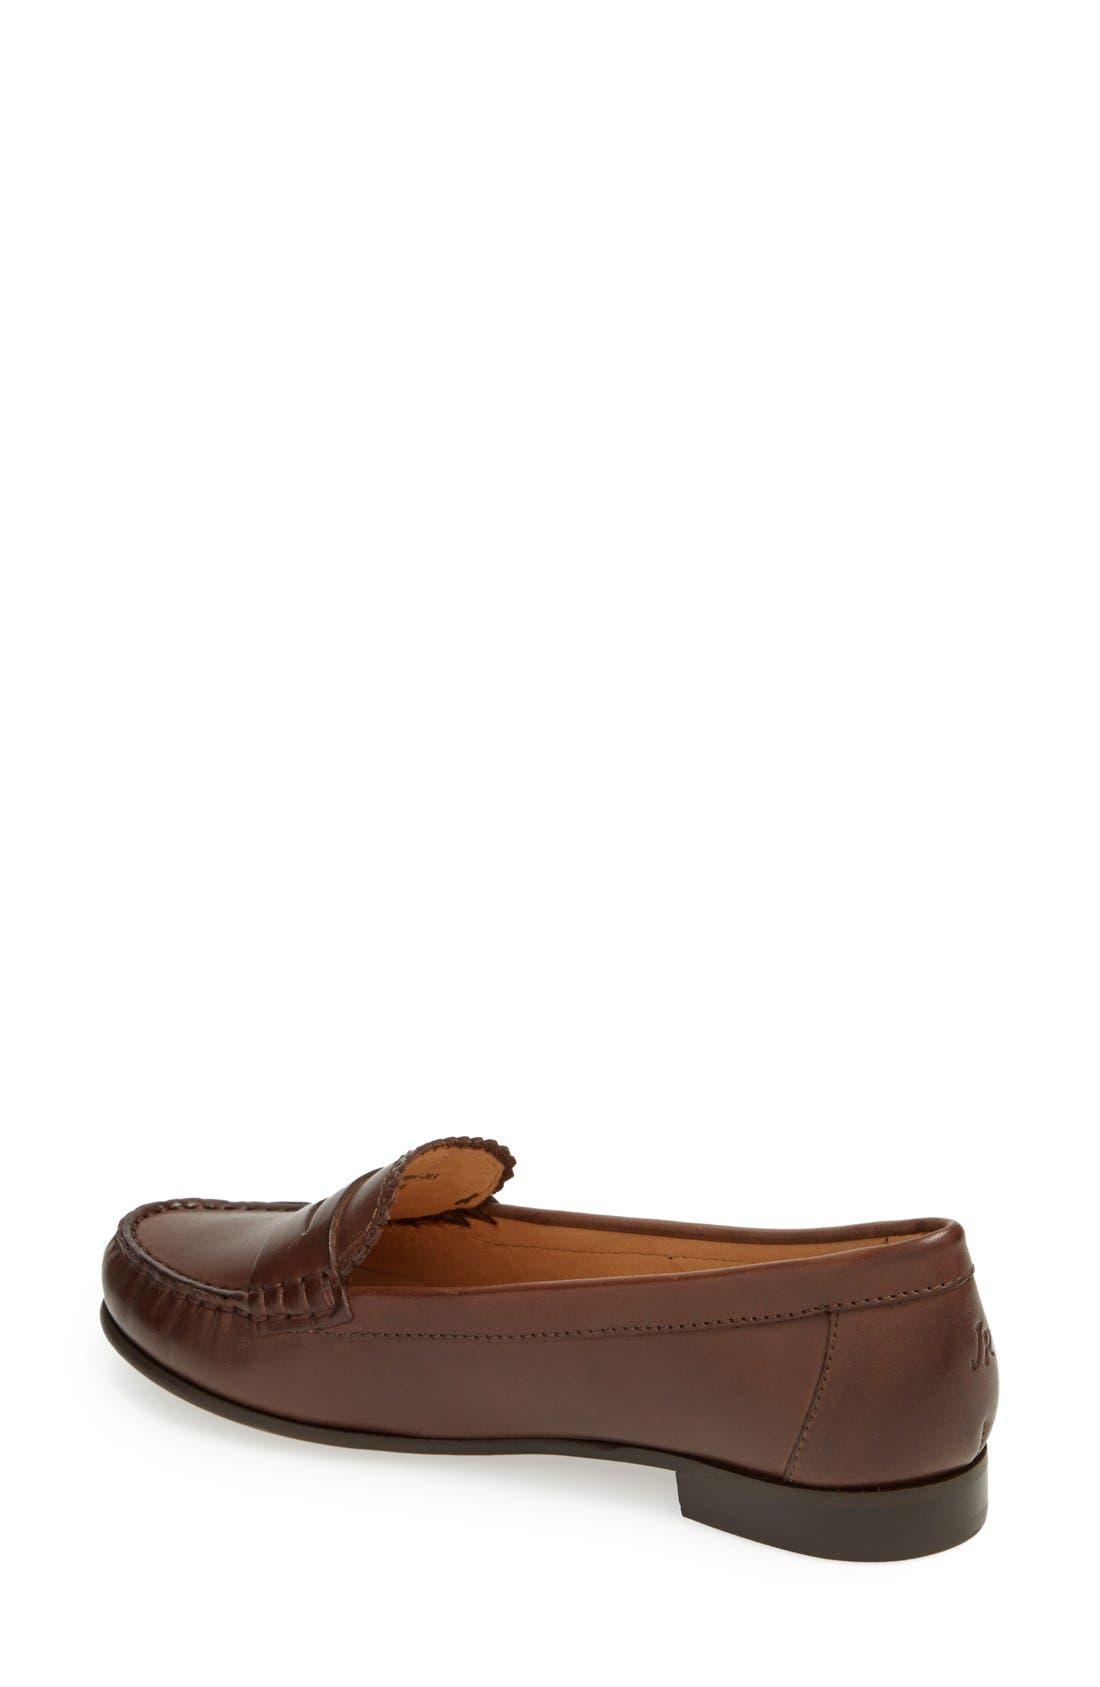 'Quinn' Leather Loafer,                             Alternate thumbnail 9, color,